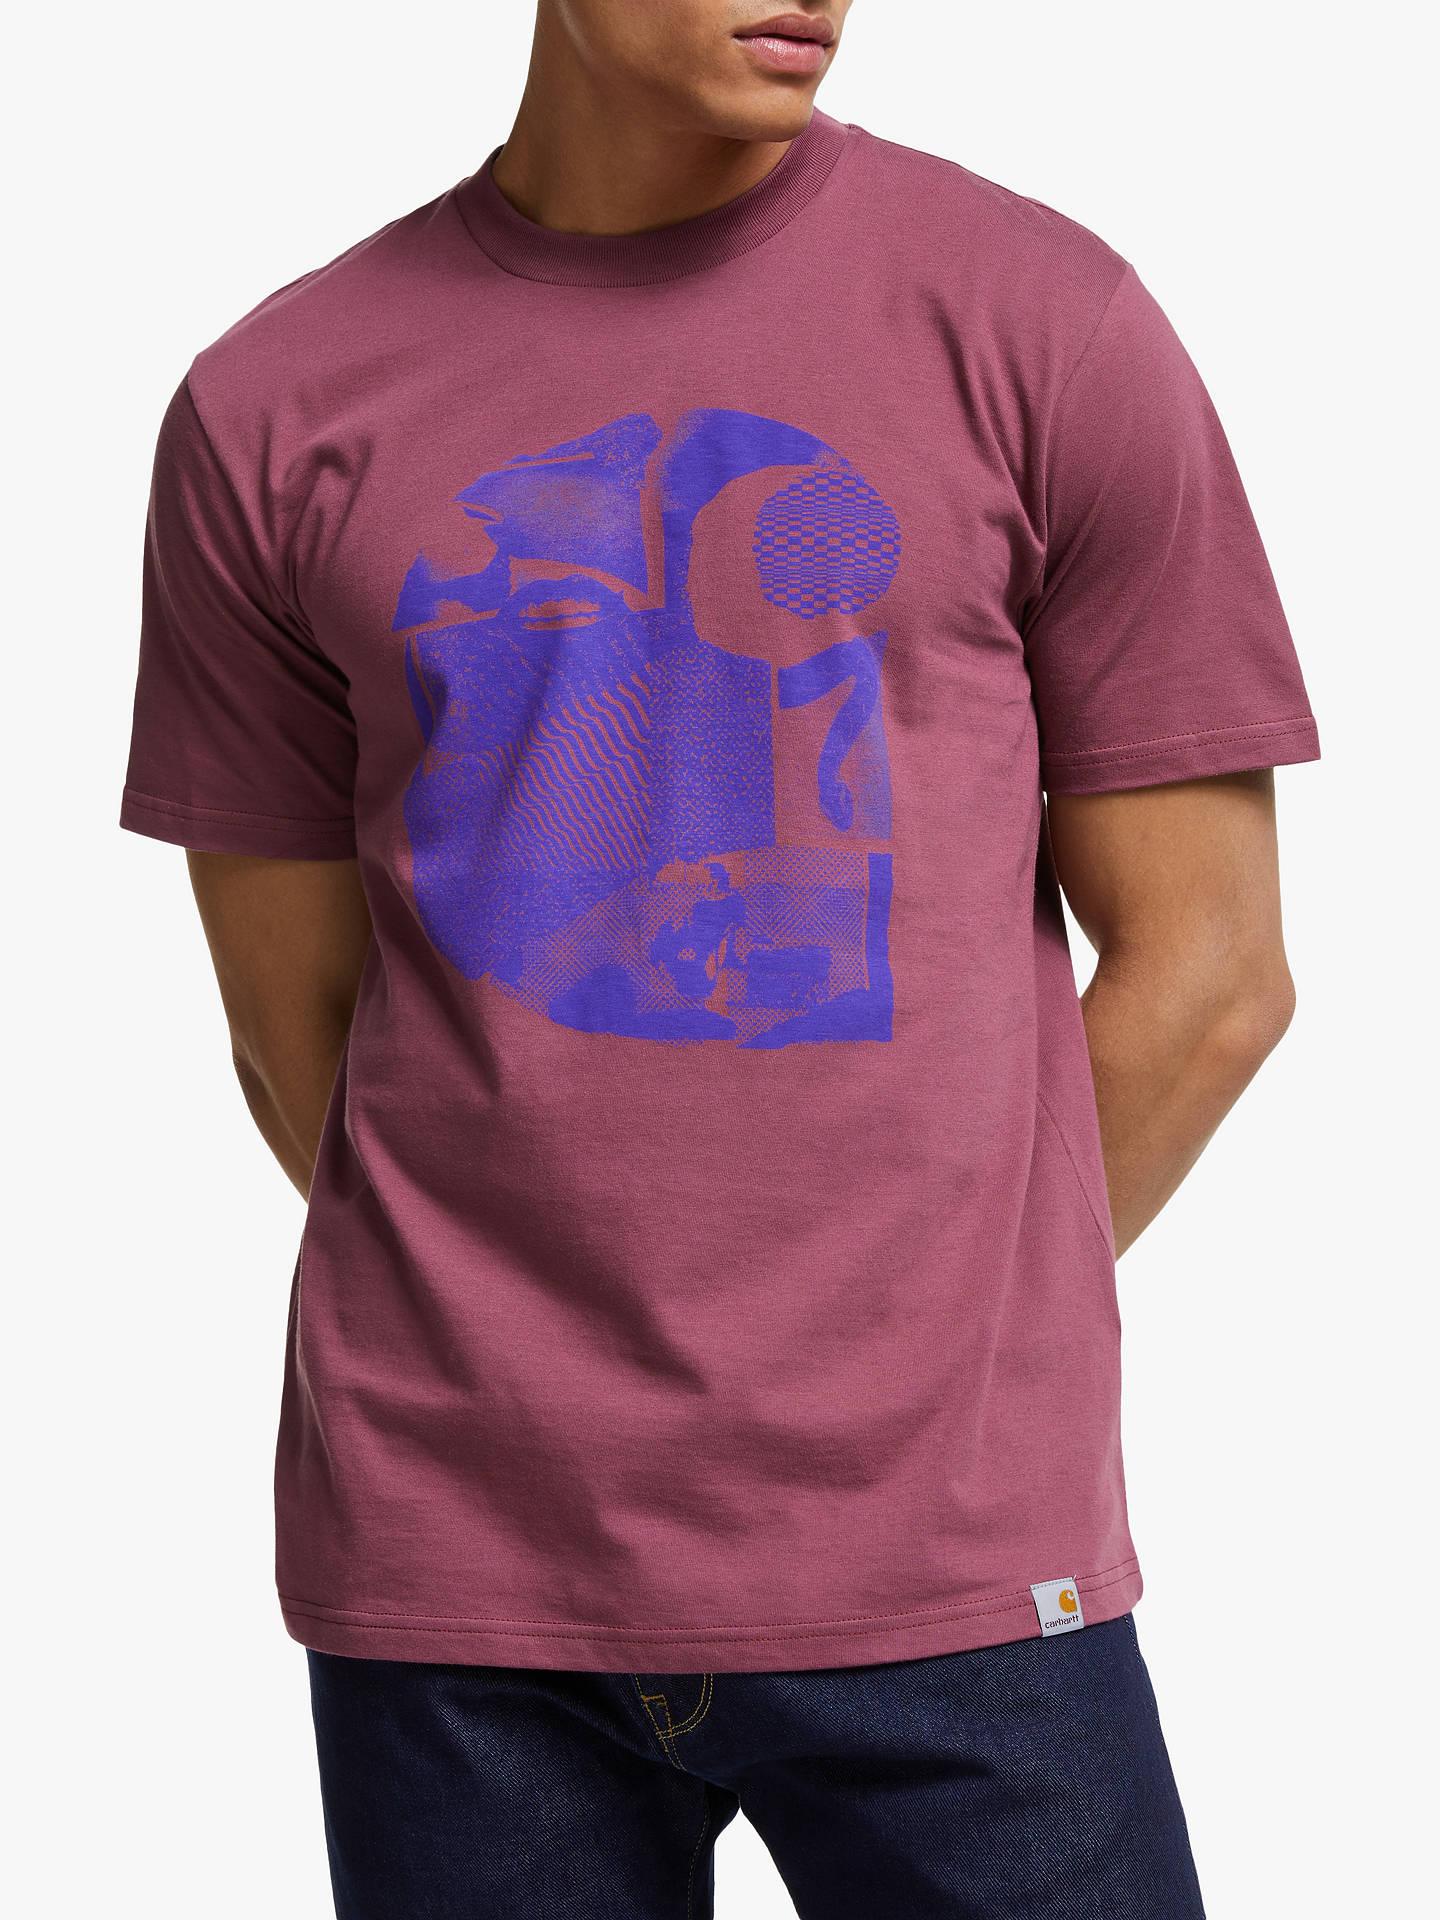 92bead4dcc2ac Carhartt WIP Cut Out T-Shirt, Dusty Fuchsia